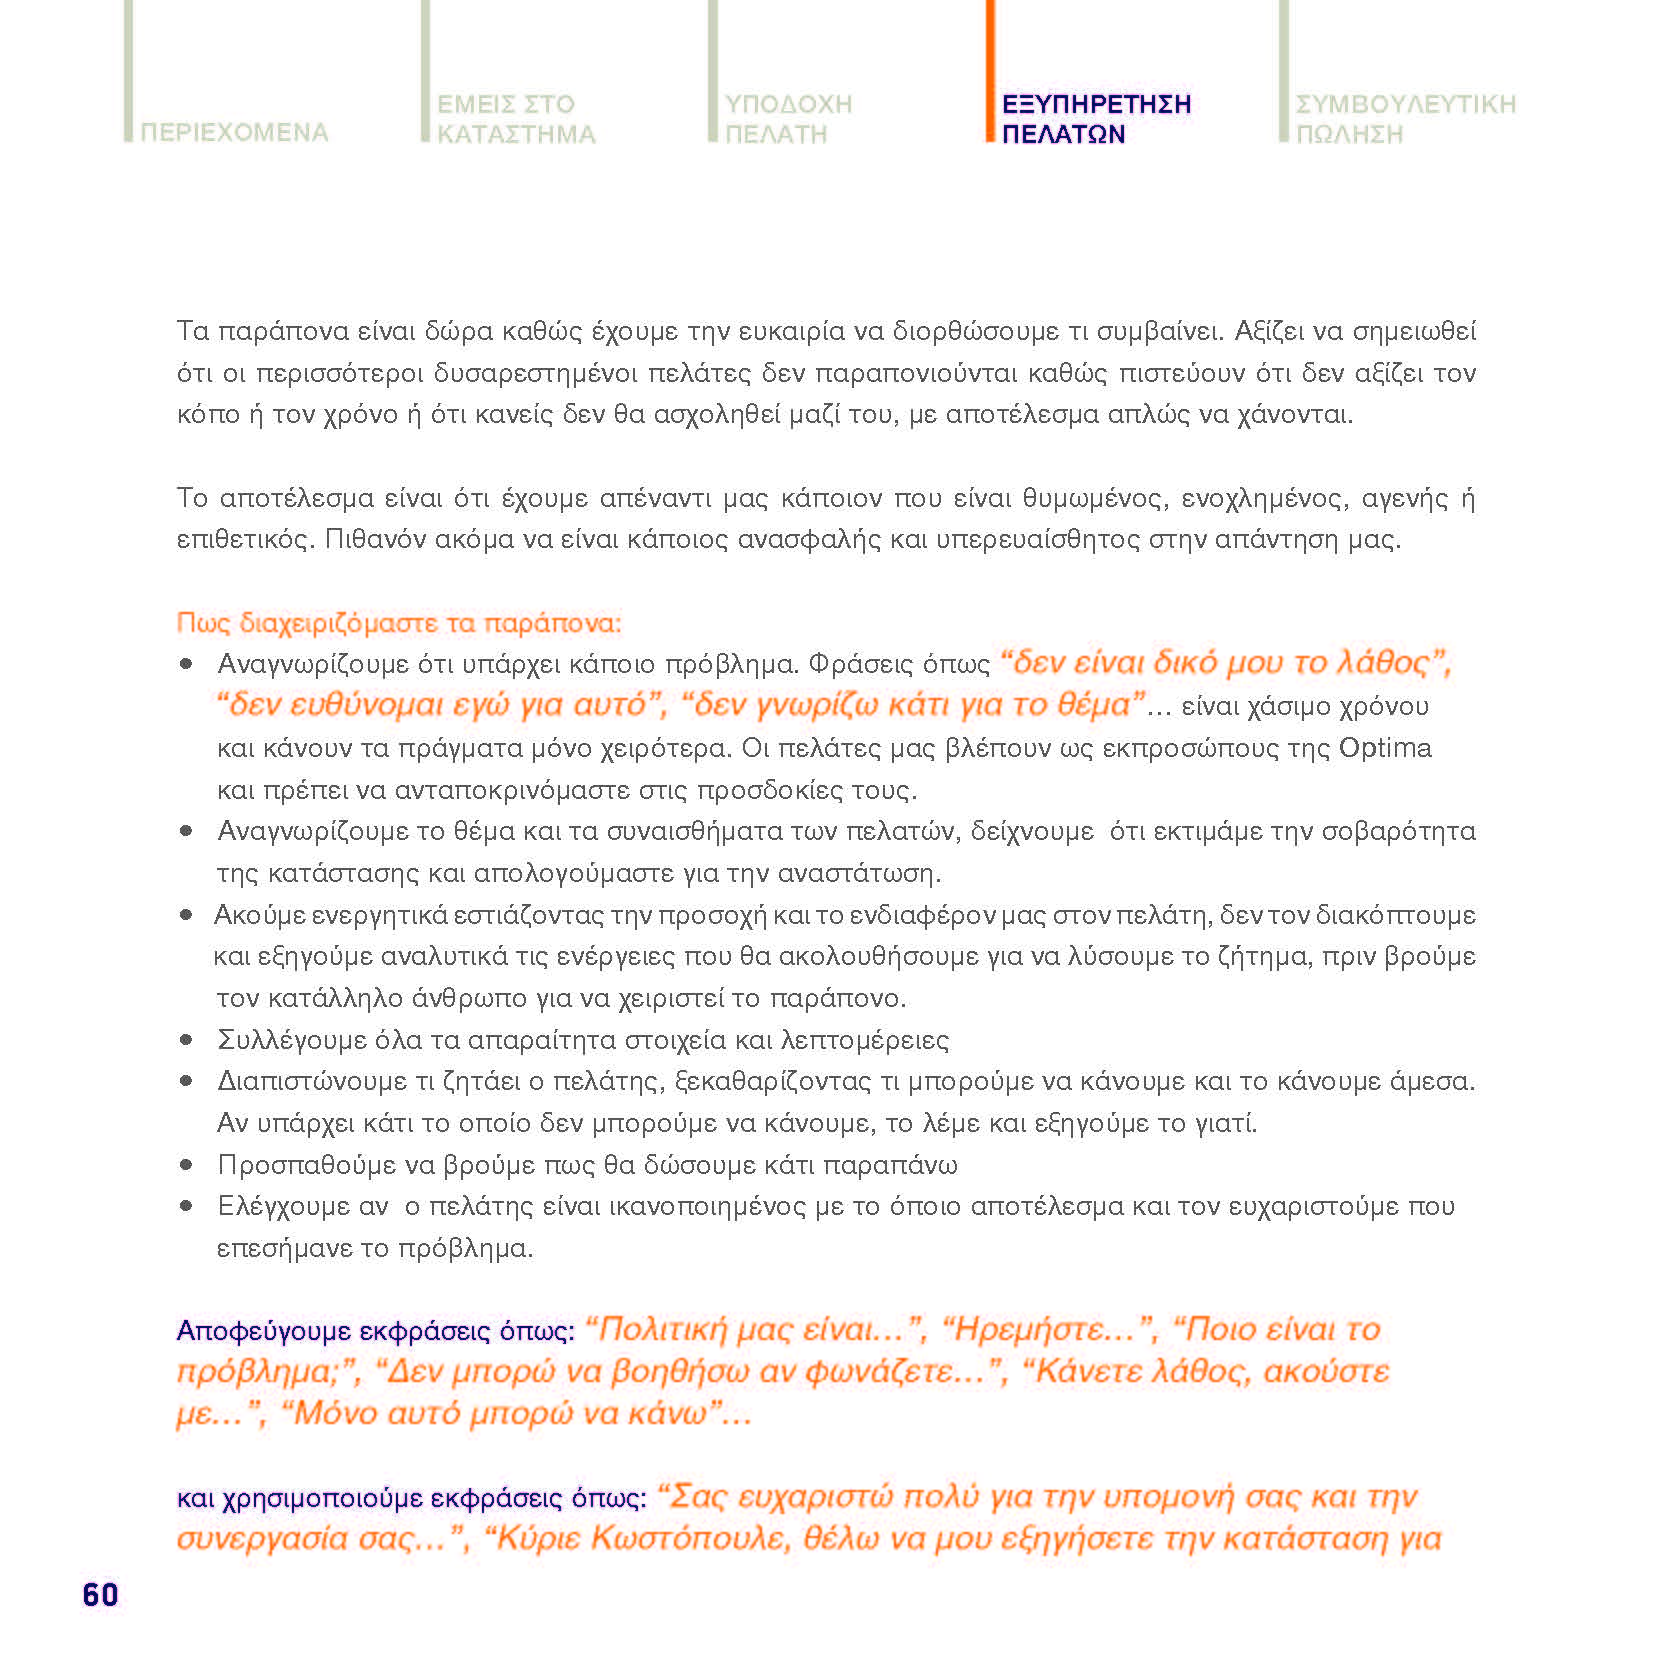 https://www.jib.gr/wp-content/uploads/2020/09/OPTIMA-BANK-BOOKLET-WEB_Page_060.jpg